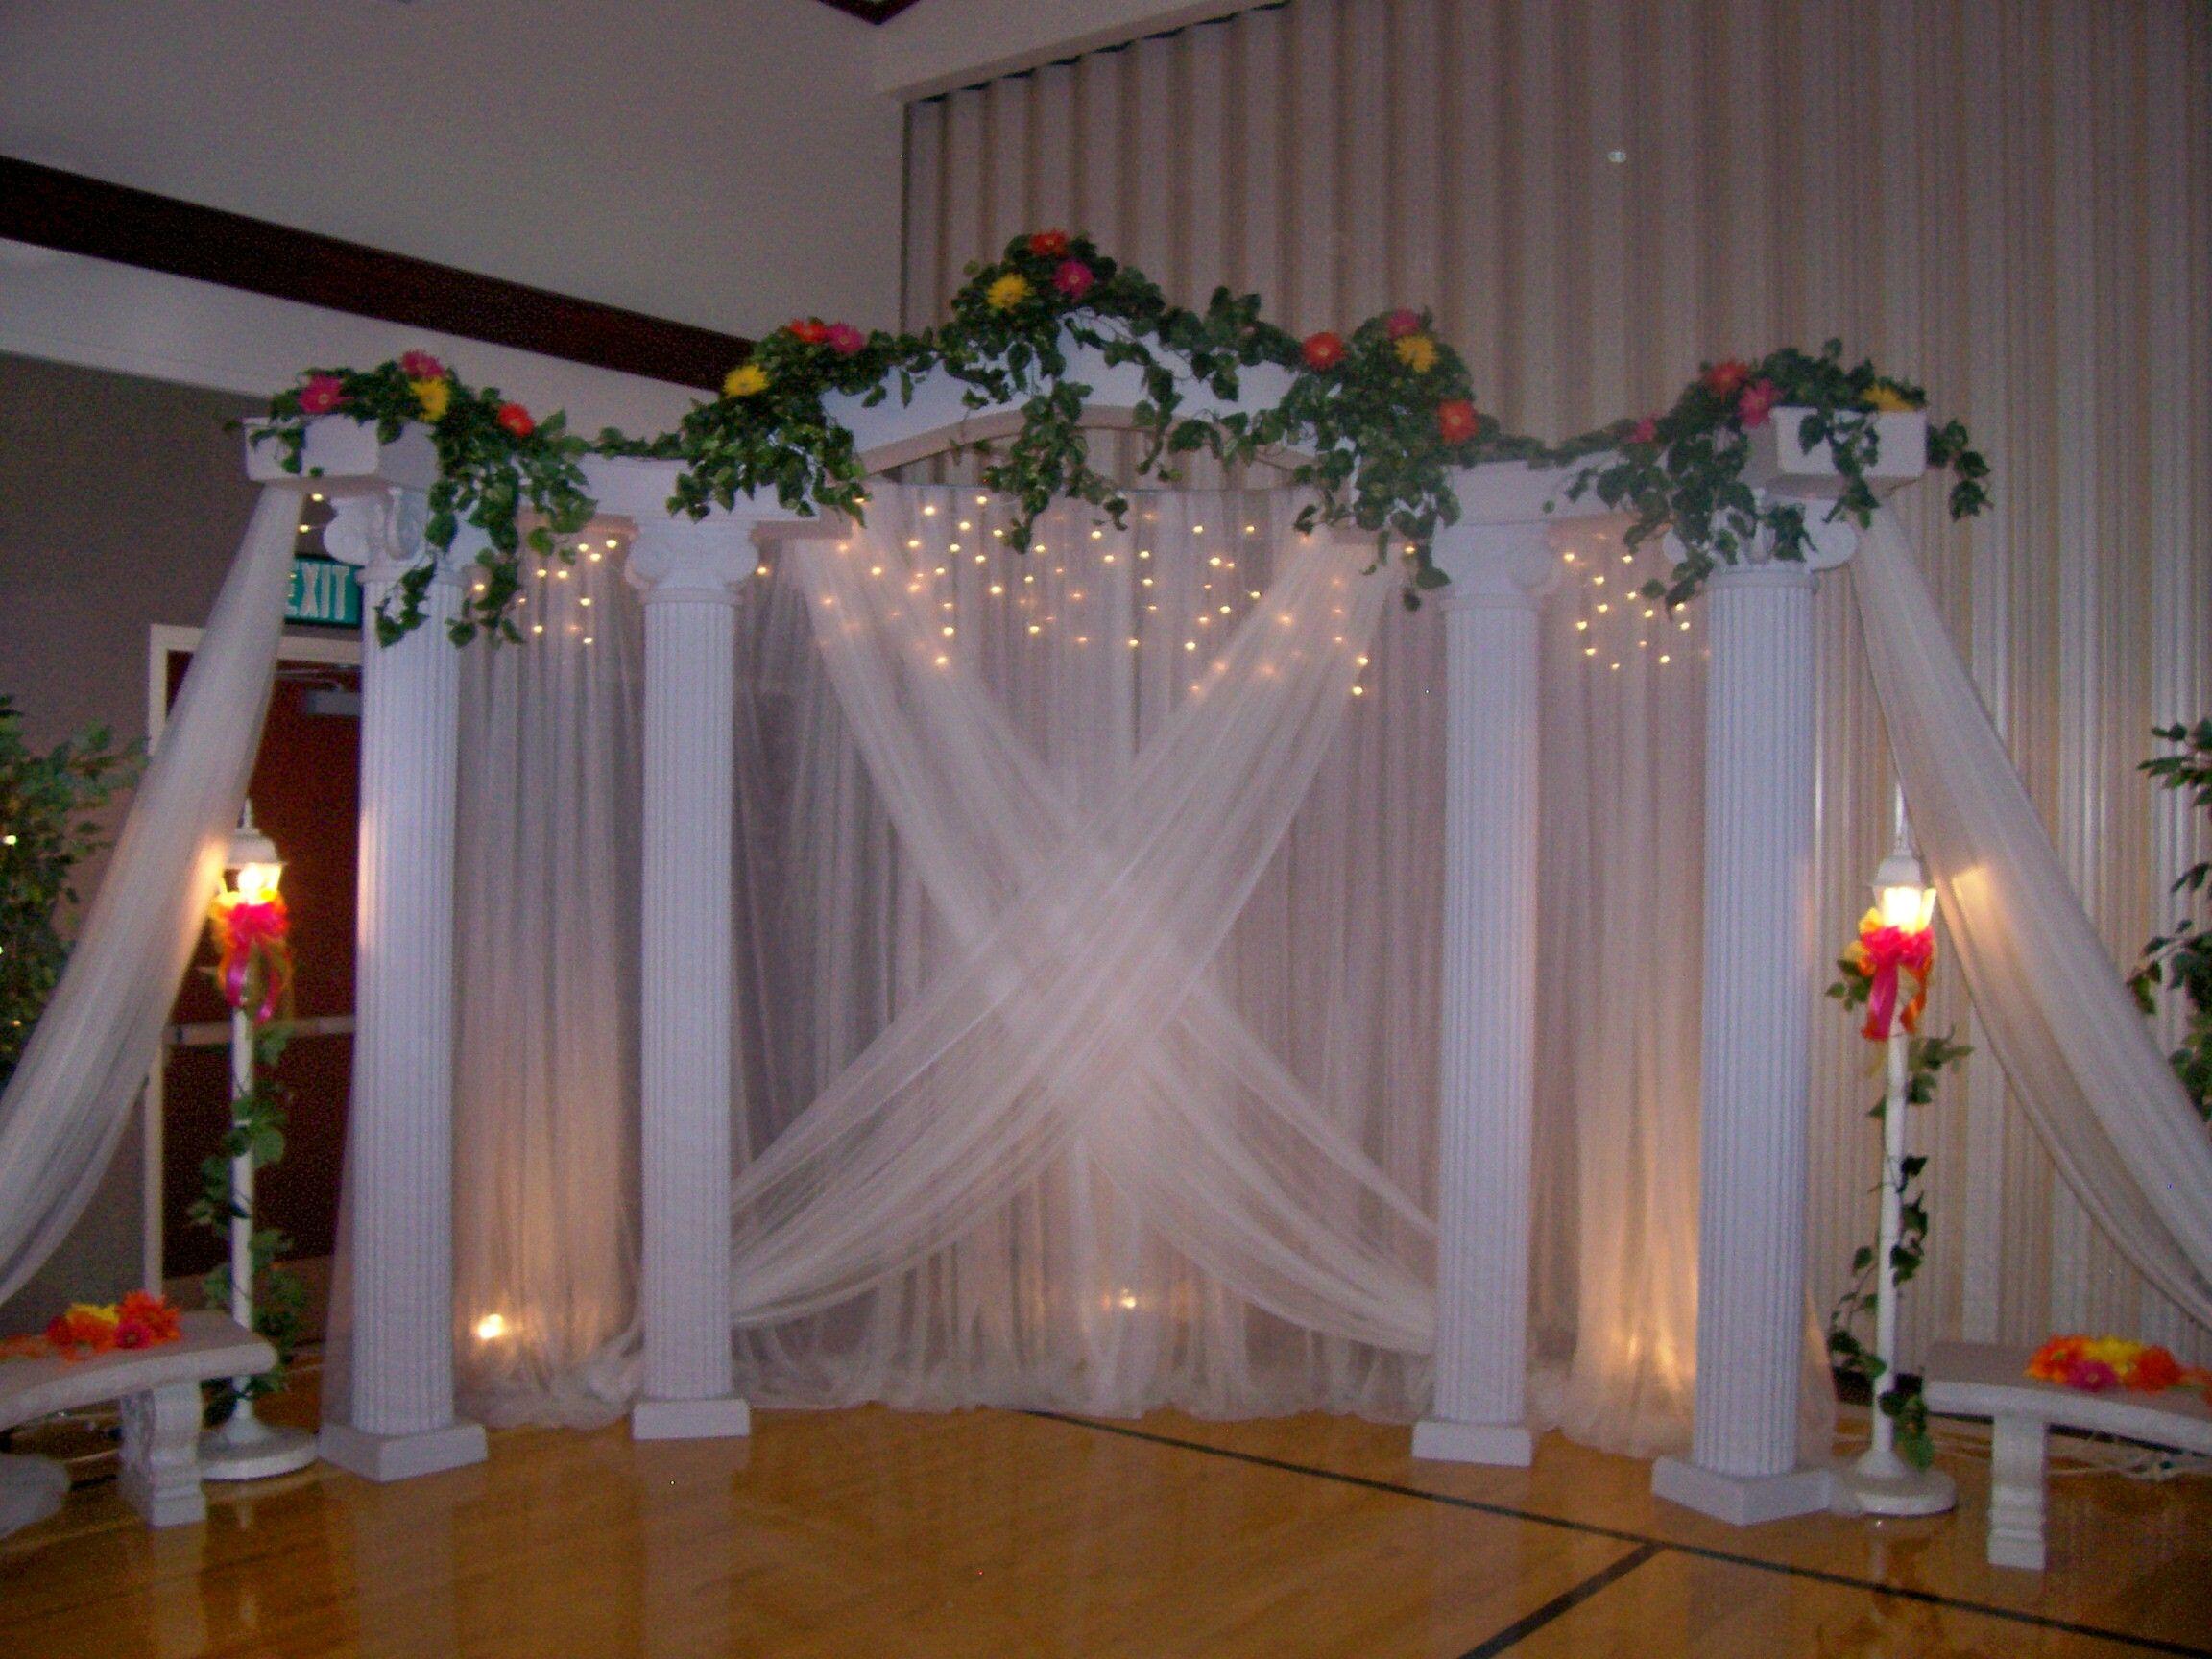 pic of wedding columns backdrops cake classic pillars door widescreen diy androids hd